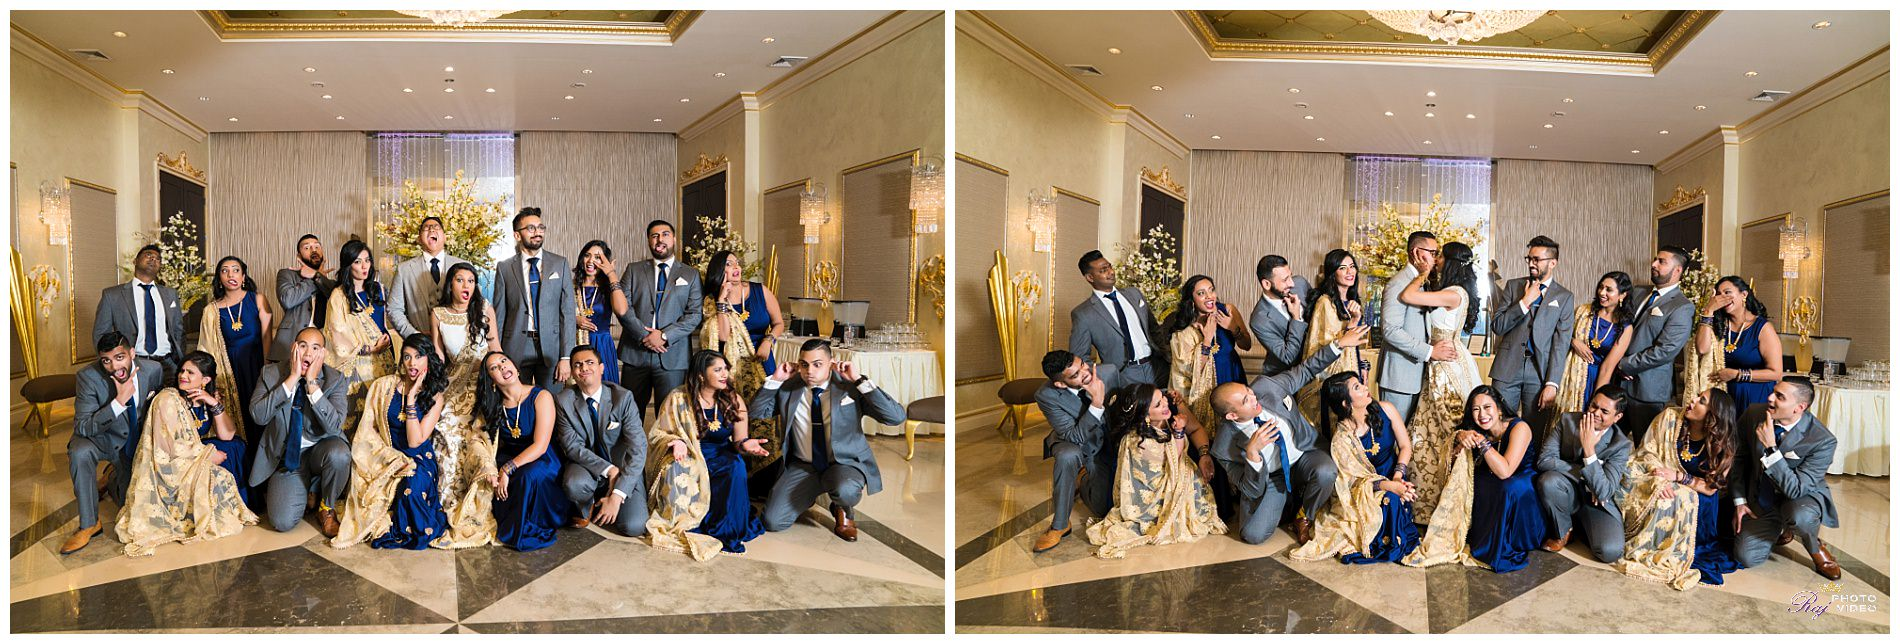 Royal-Manor-Garfield-NJ-Christian-Wedding-Ceremony-Khusbu-Jeff-31.jpg